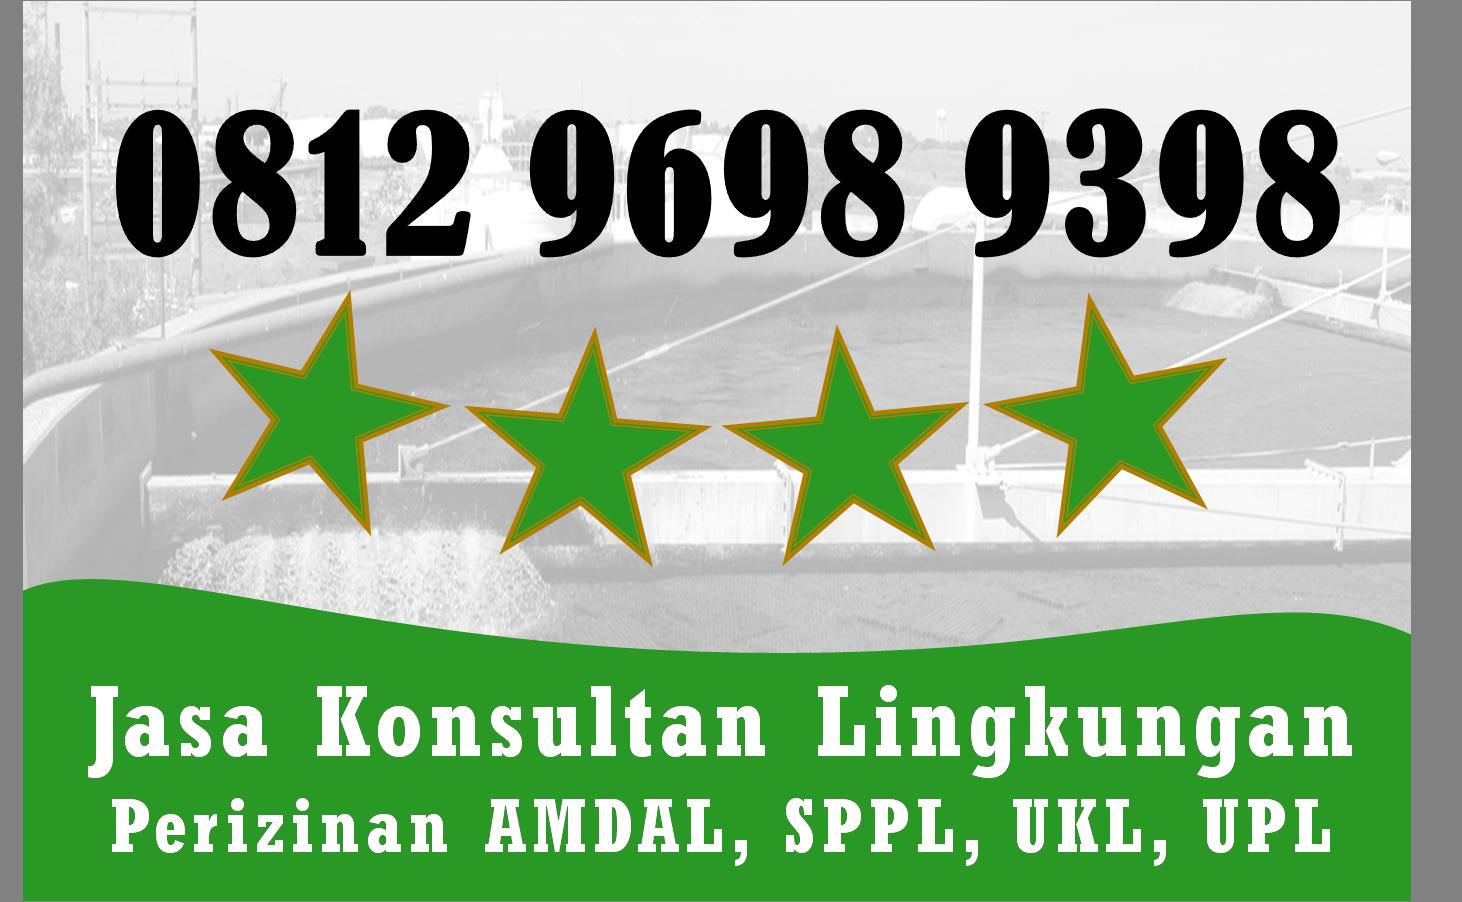 Hanya Disini Telp Wa 0812 9698 9398 Dokumen Ukl Upl Industri Kab Bangkalan Jawa Timur Di 2020 Kota Bukittinggi Kendaraan Kota Perjalanan Kota